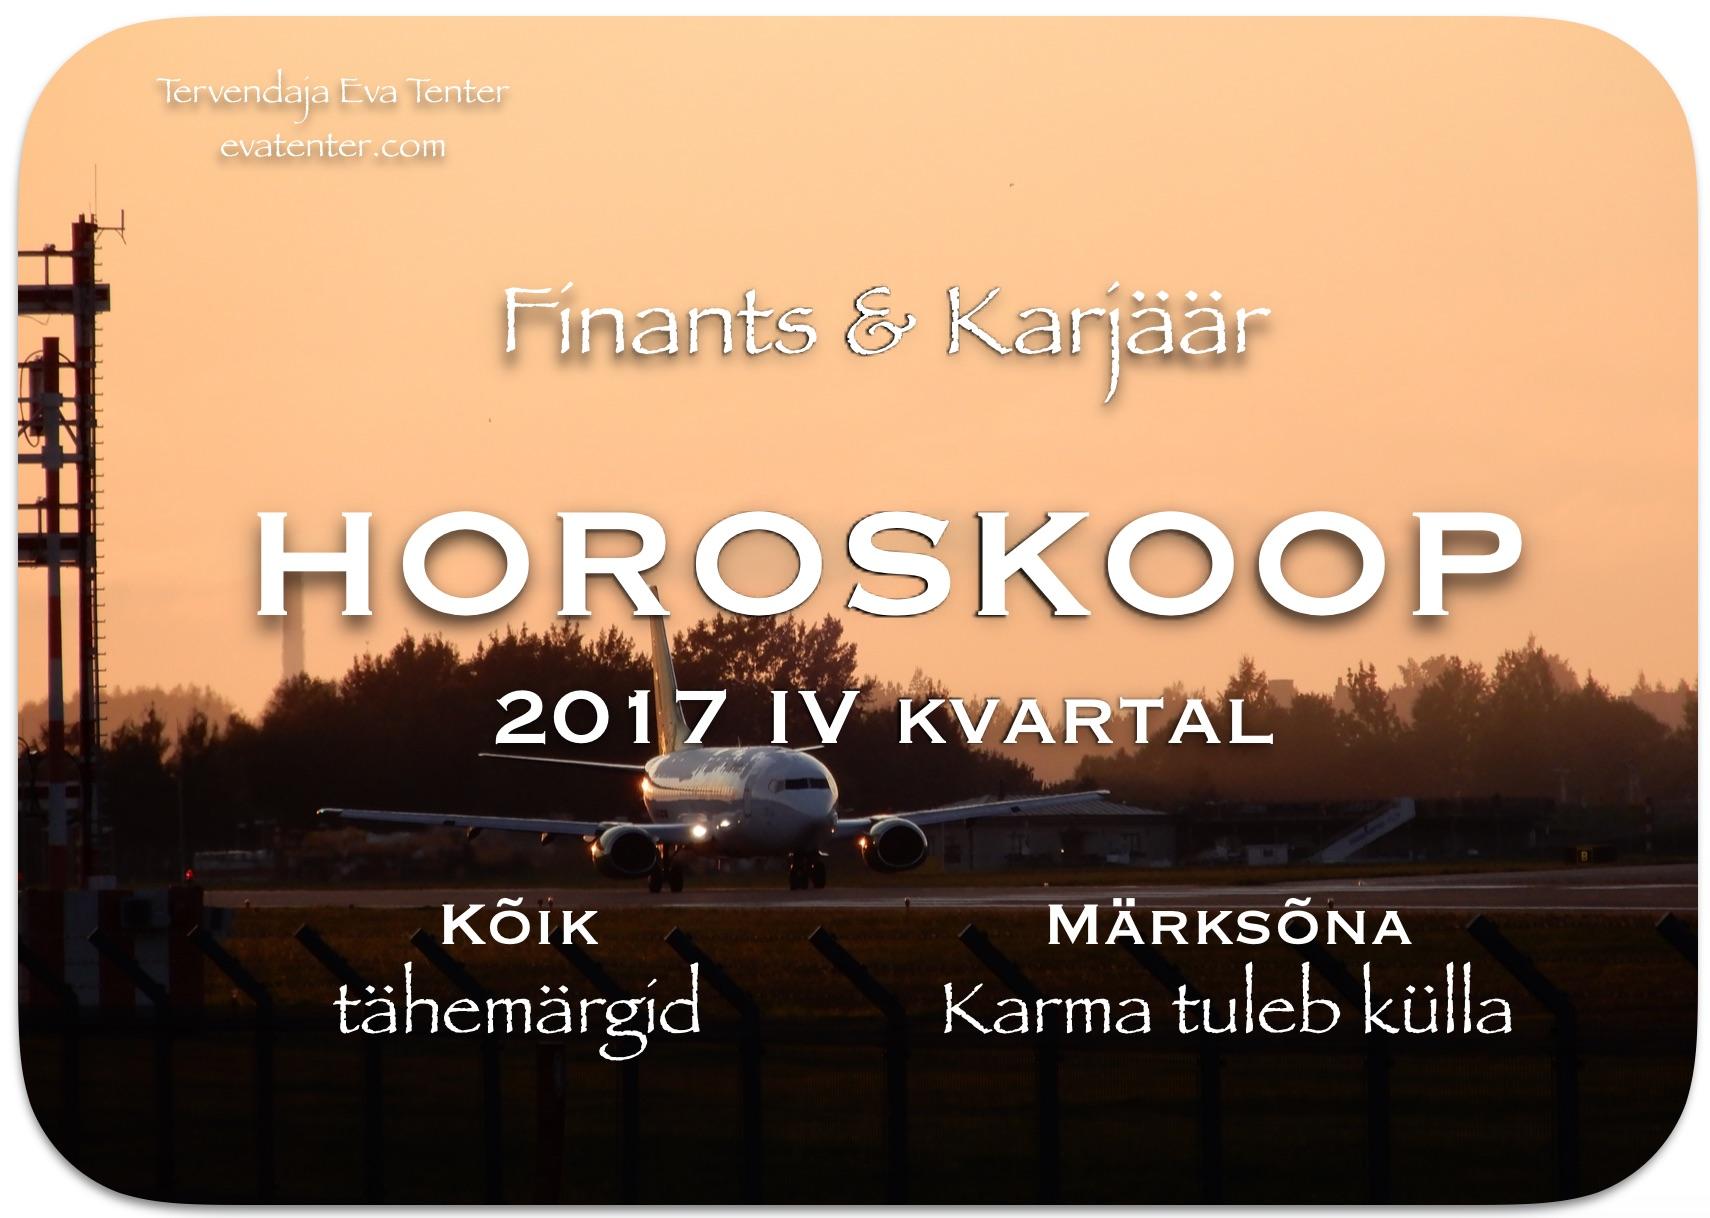 2017 IV kvartali horoskoop (oktoober, november, detsember) – Finants & Karjäär – Kõik tähemärgid